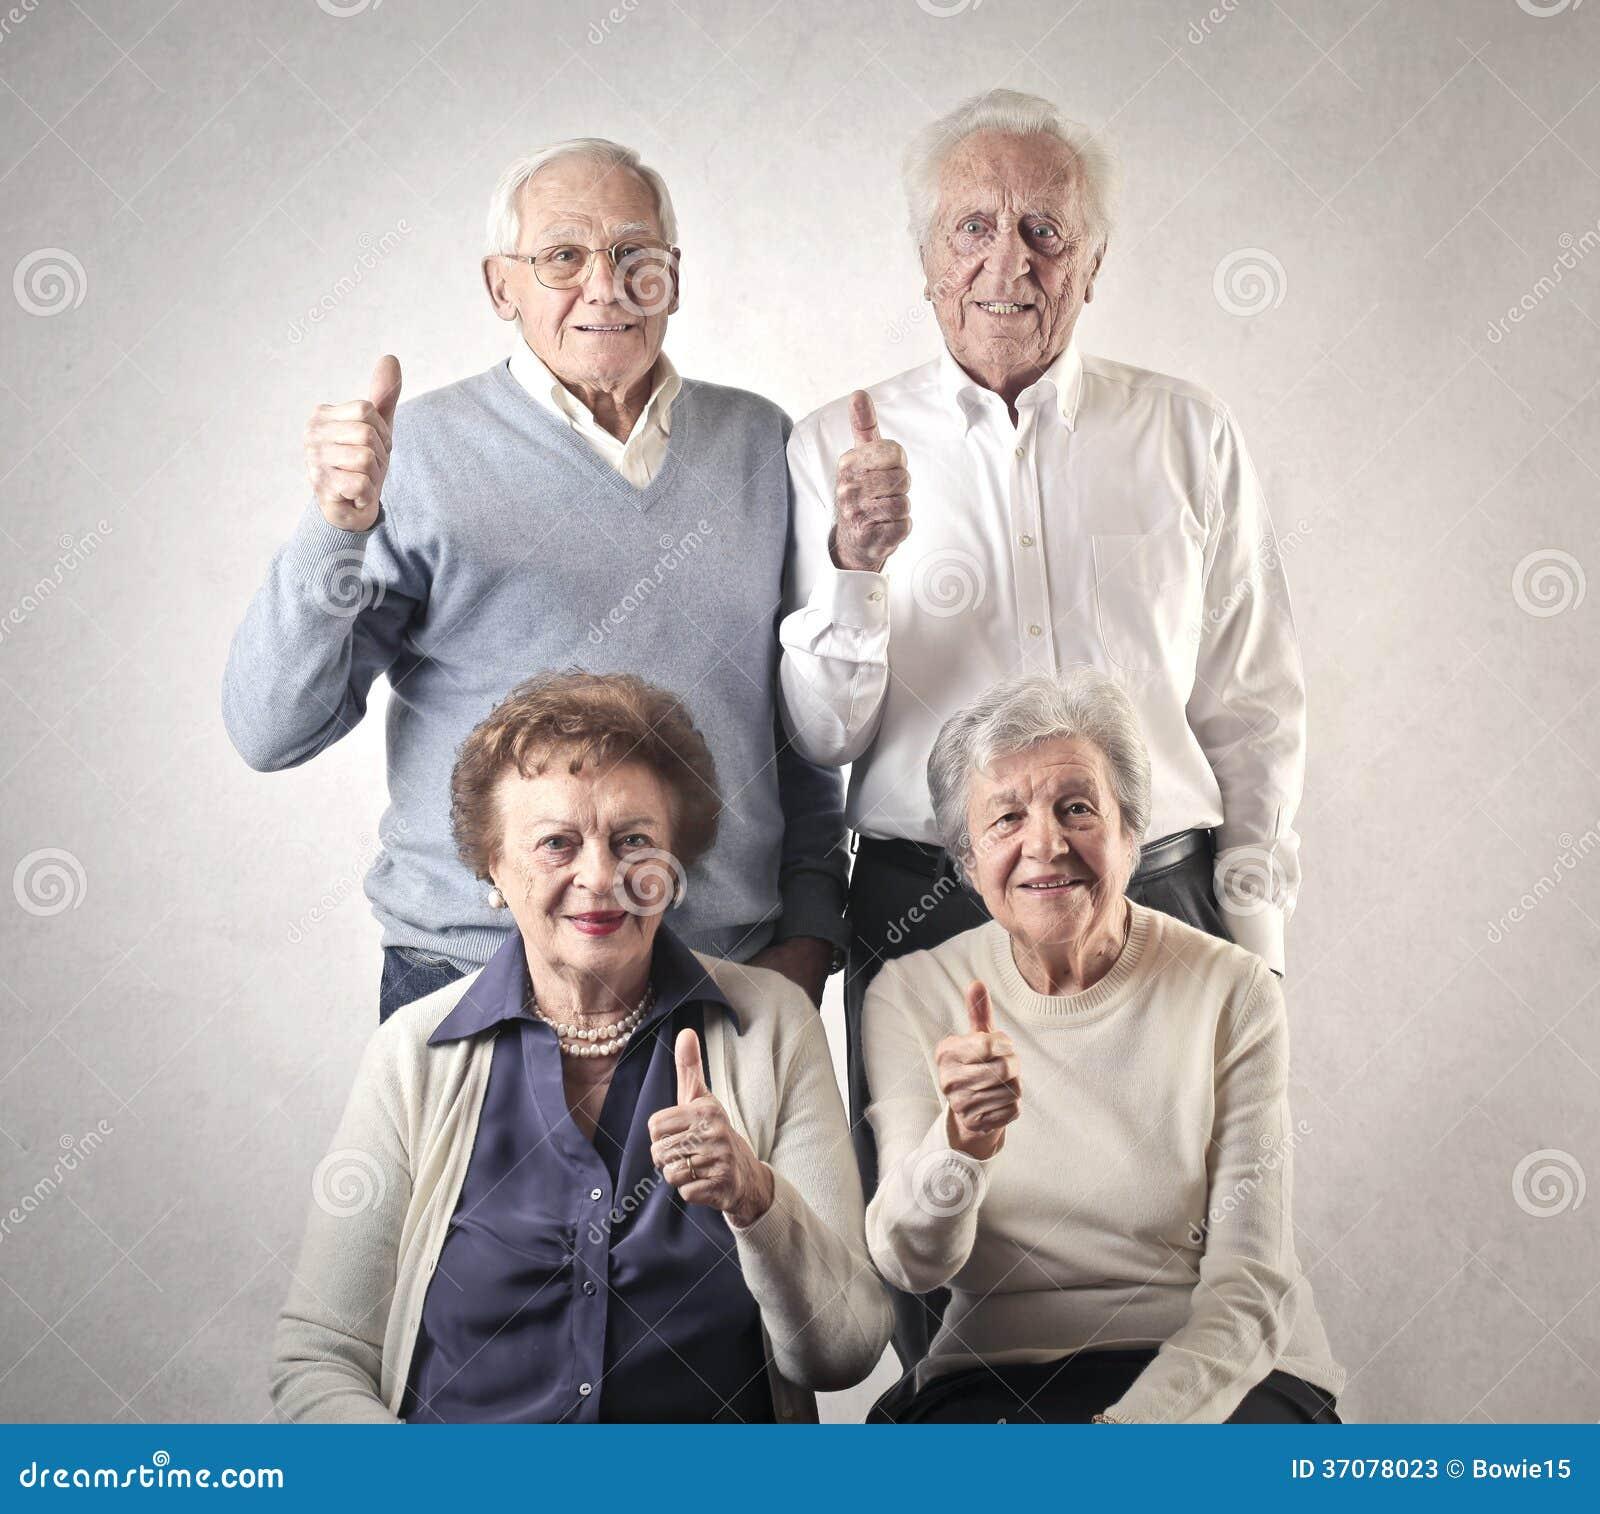 Старики с красоткой фото 301-989